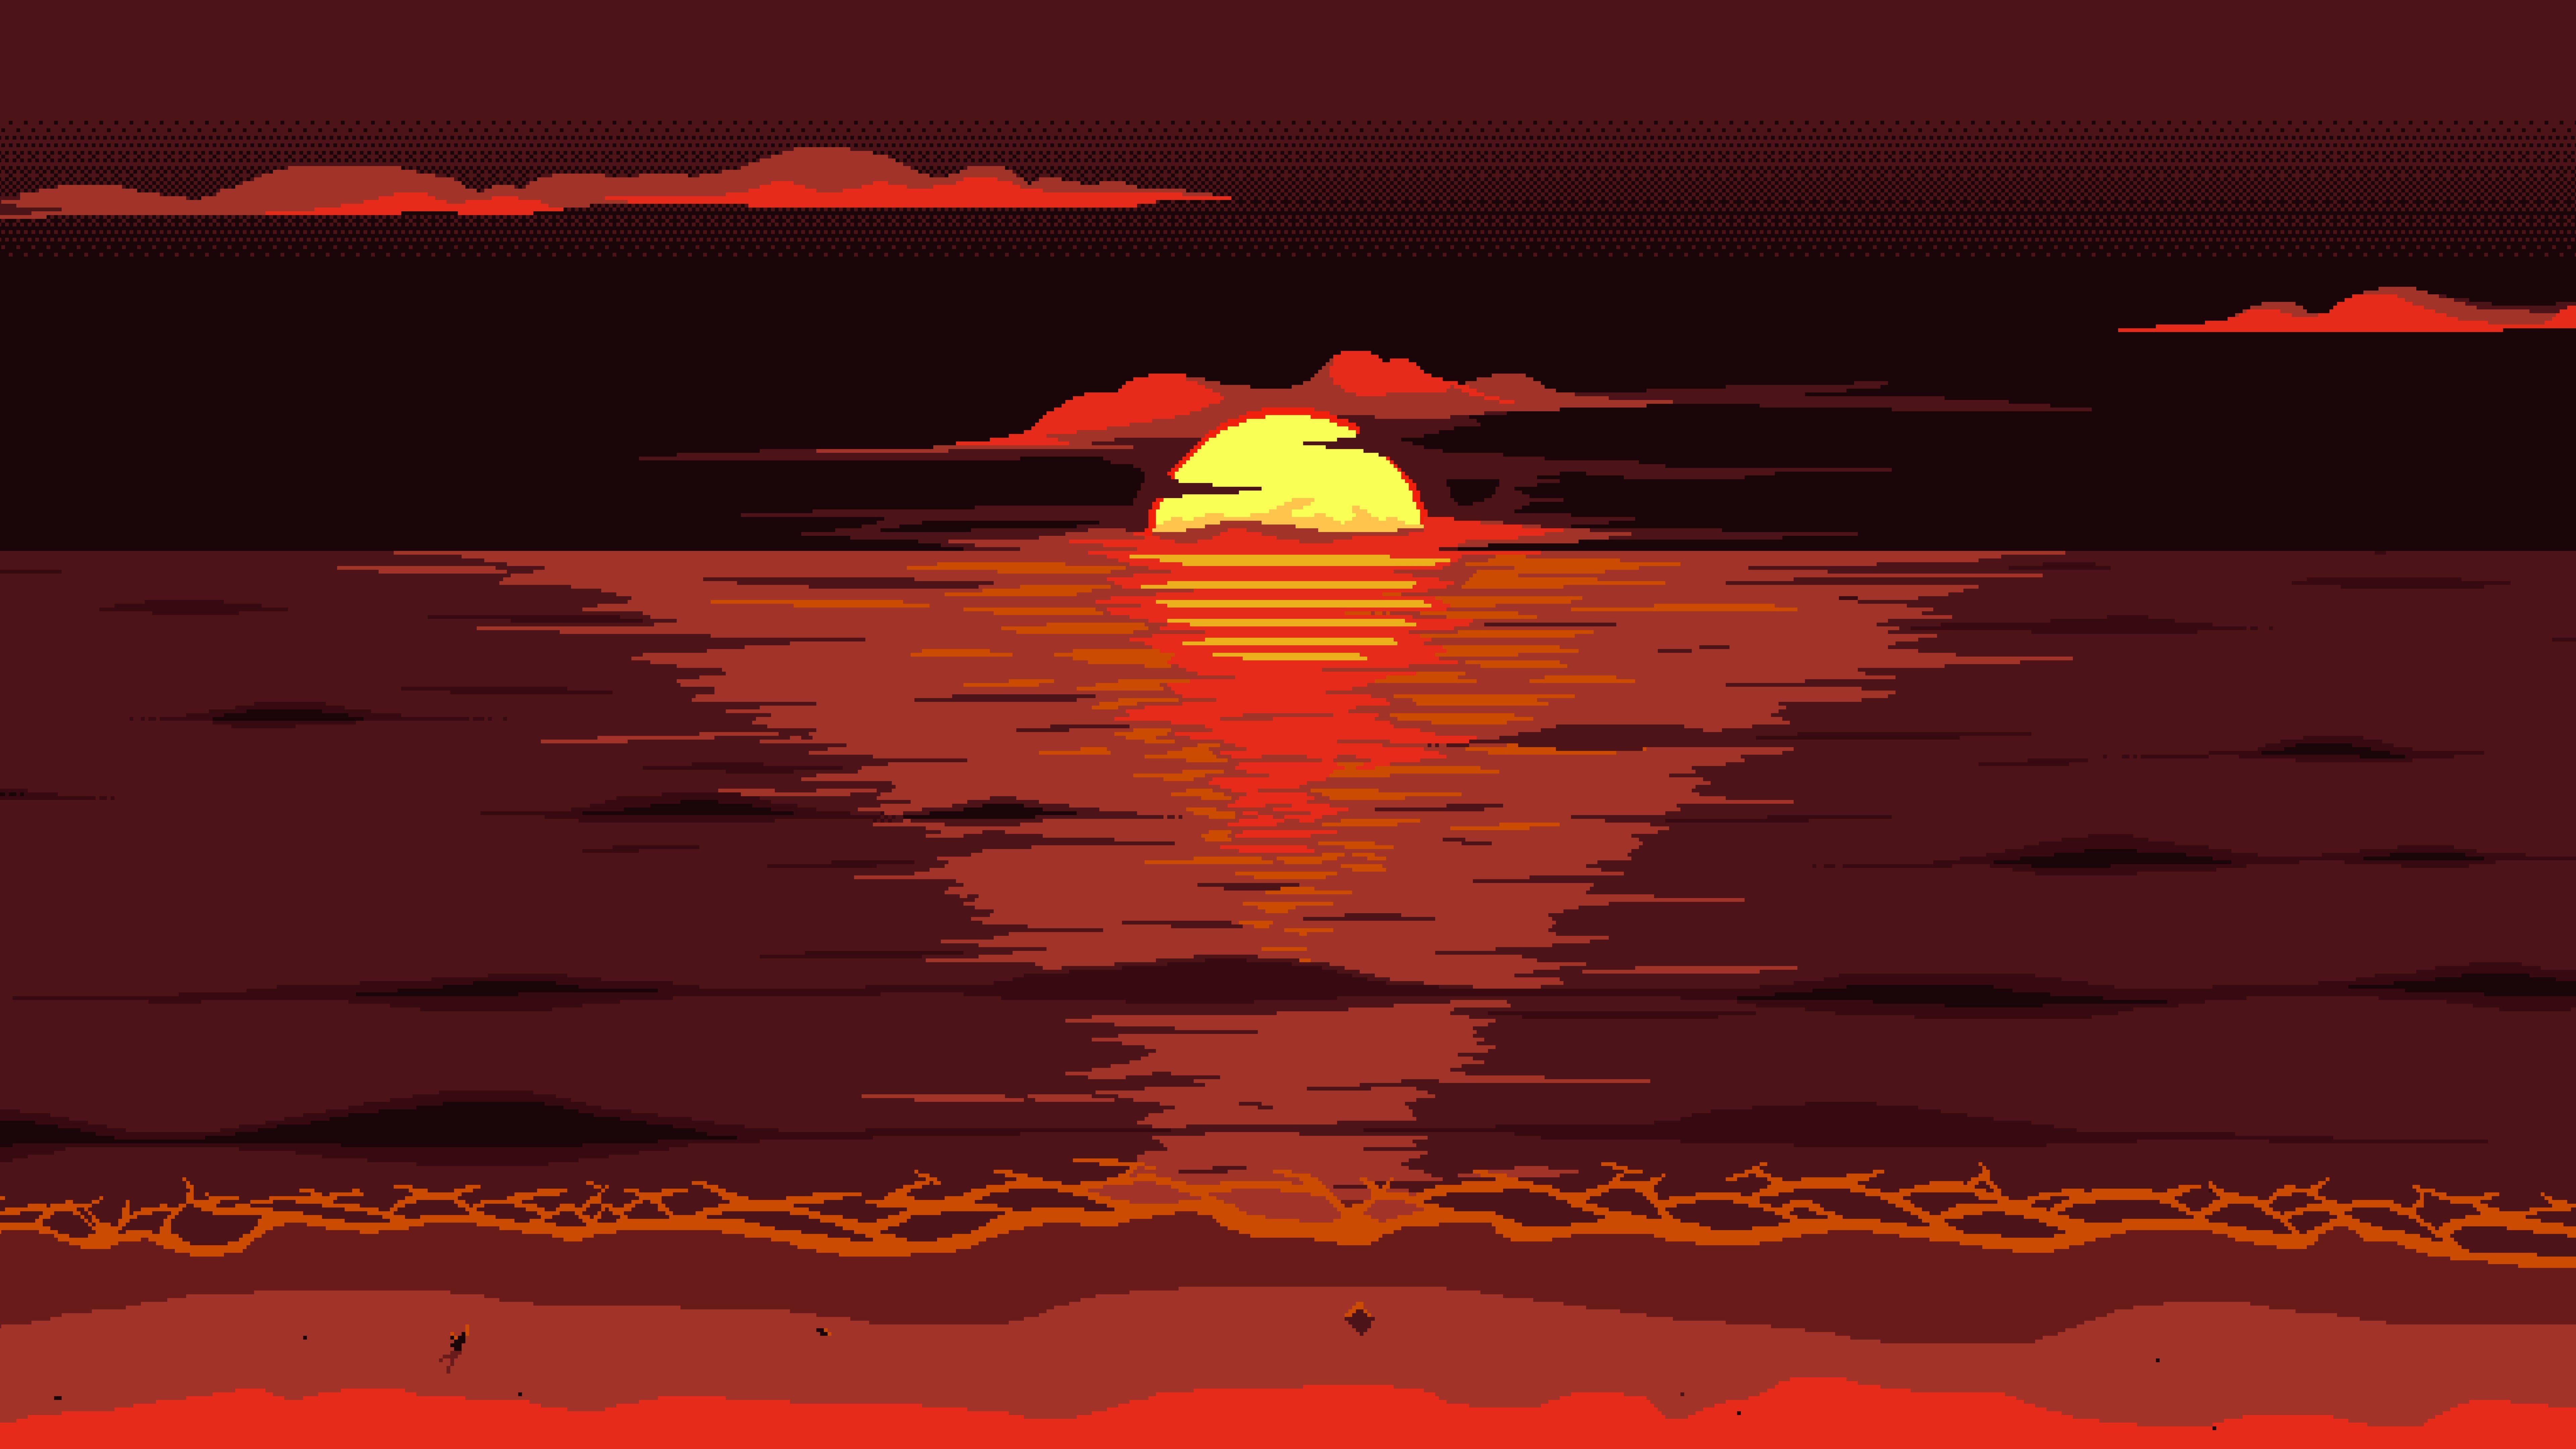 Studio Ghibli Pixel Art Post In 2020 Edgy Wallpaper Nature Iphone Wallpaper Aesthetic Tumblr Backgrounds